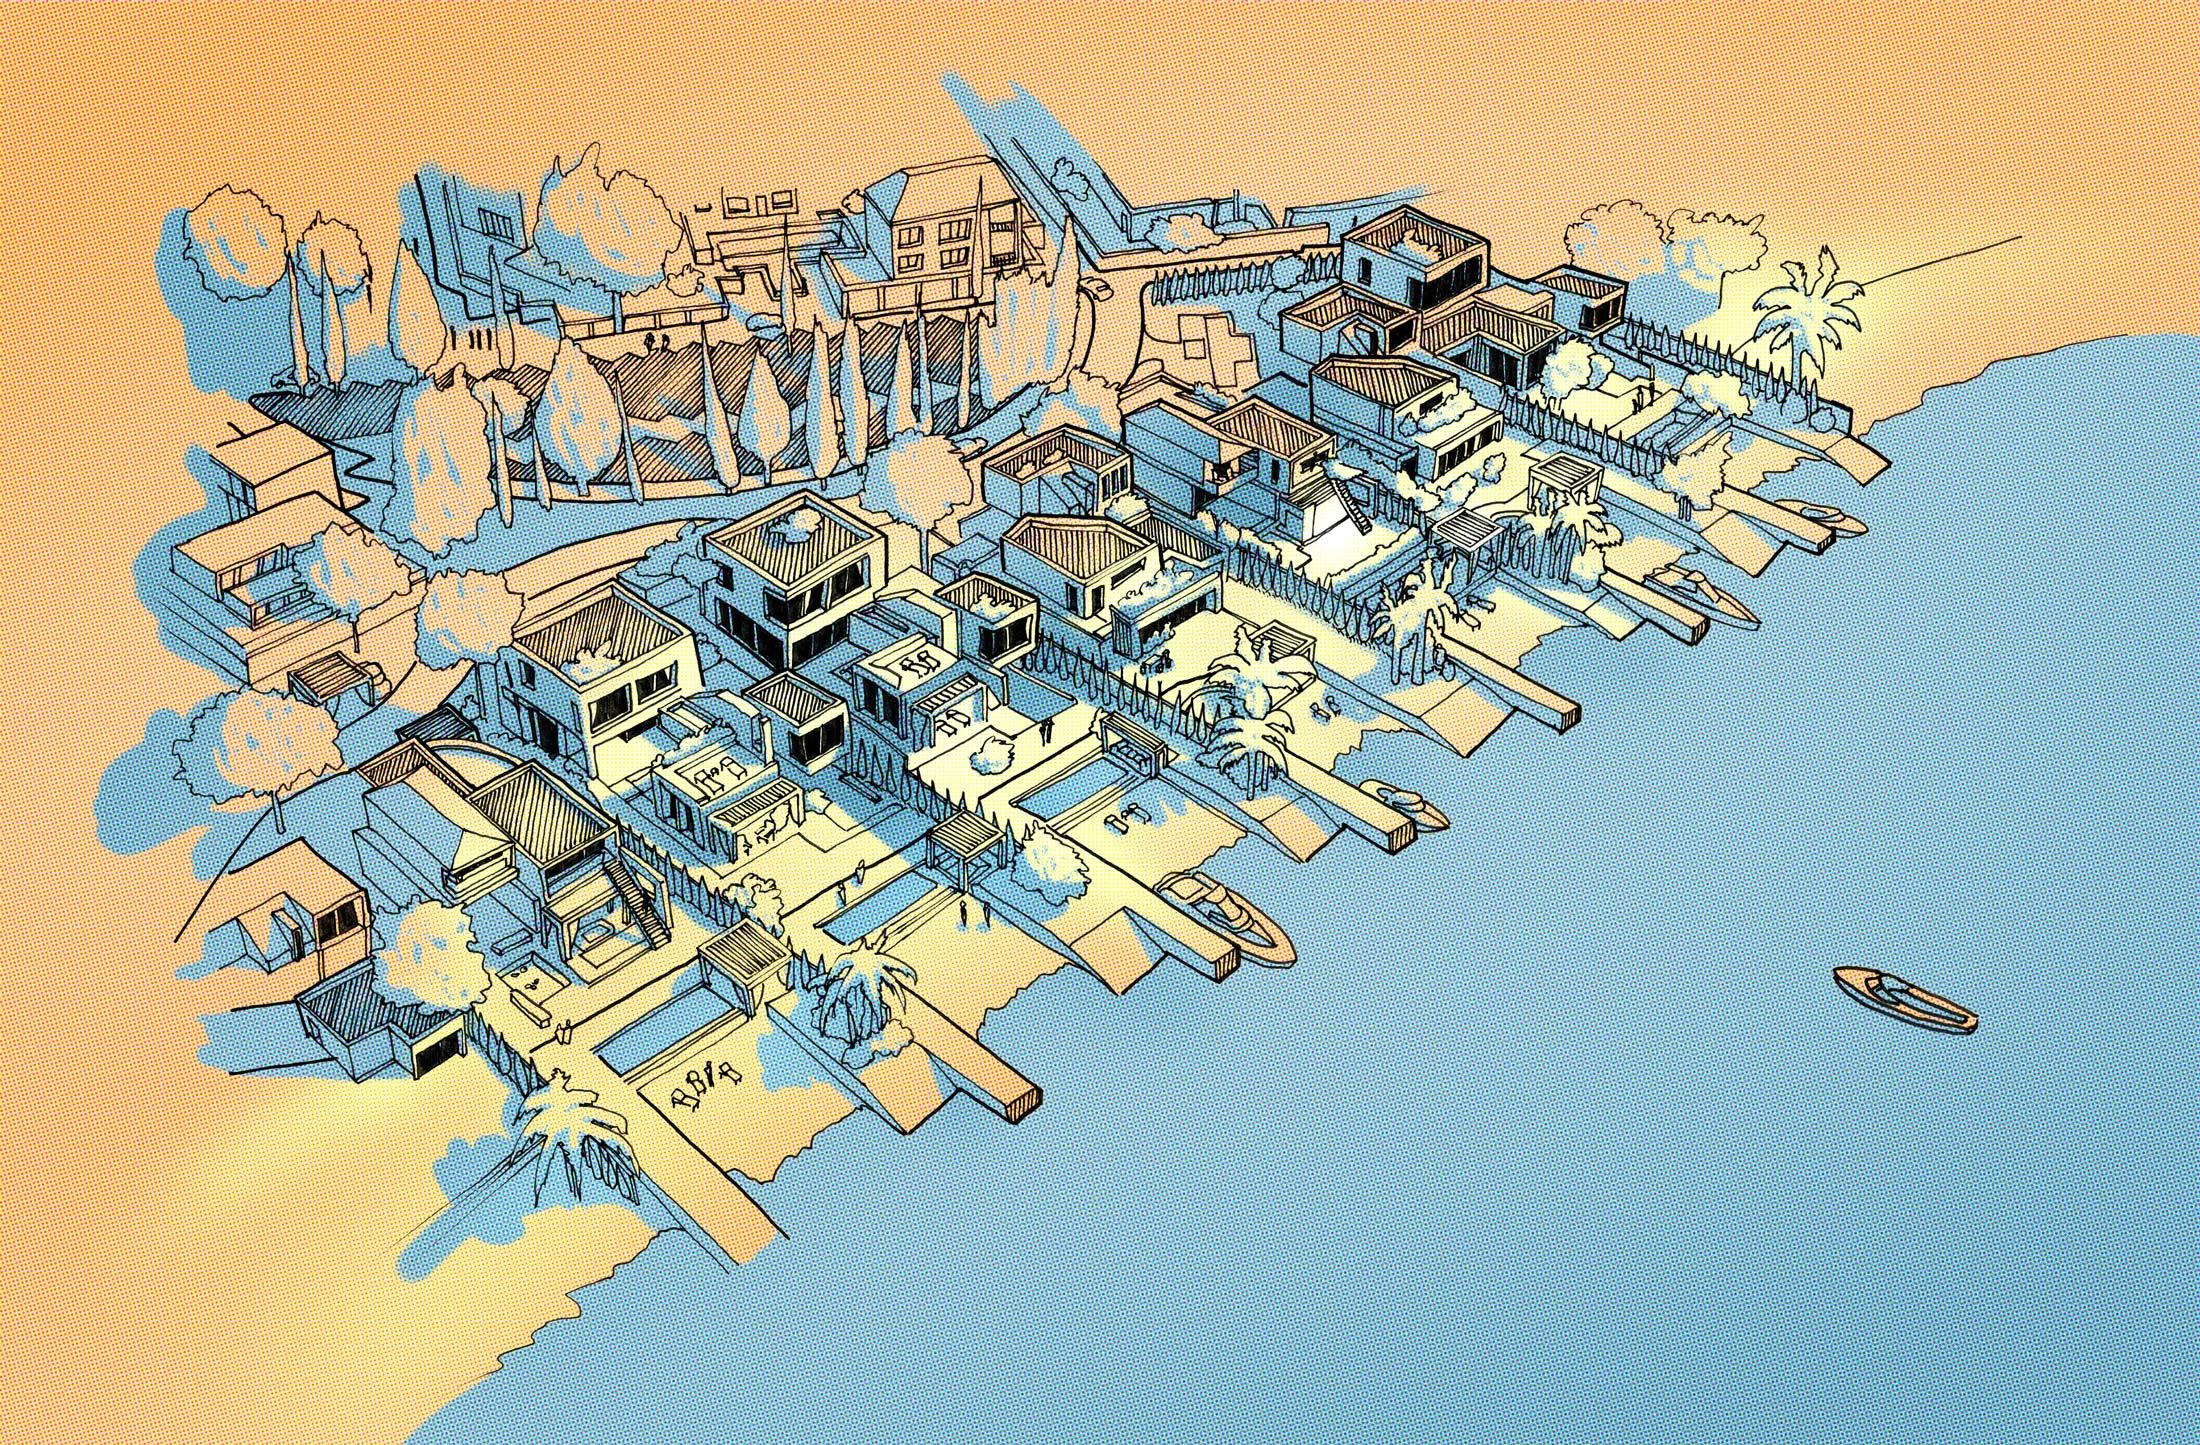 Alex-Kaiser-Different-illustration-CGI-london-visualisation-architecture-07.jpg